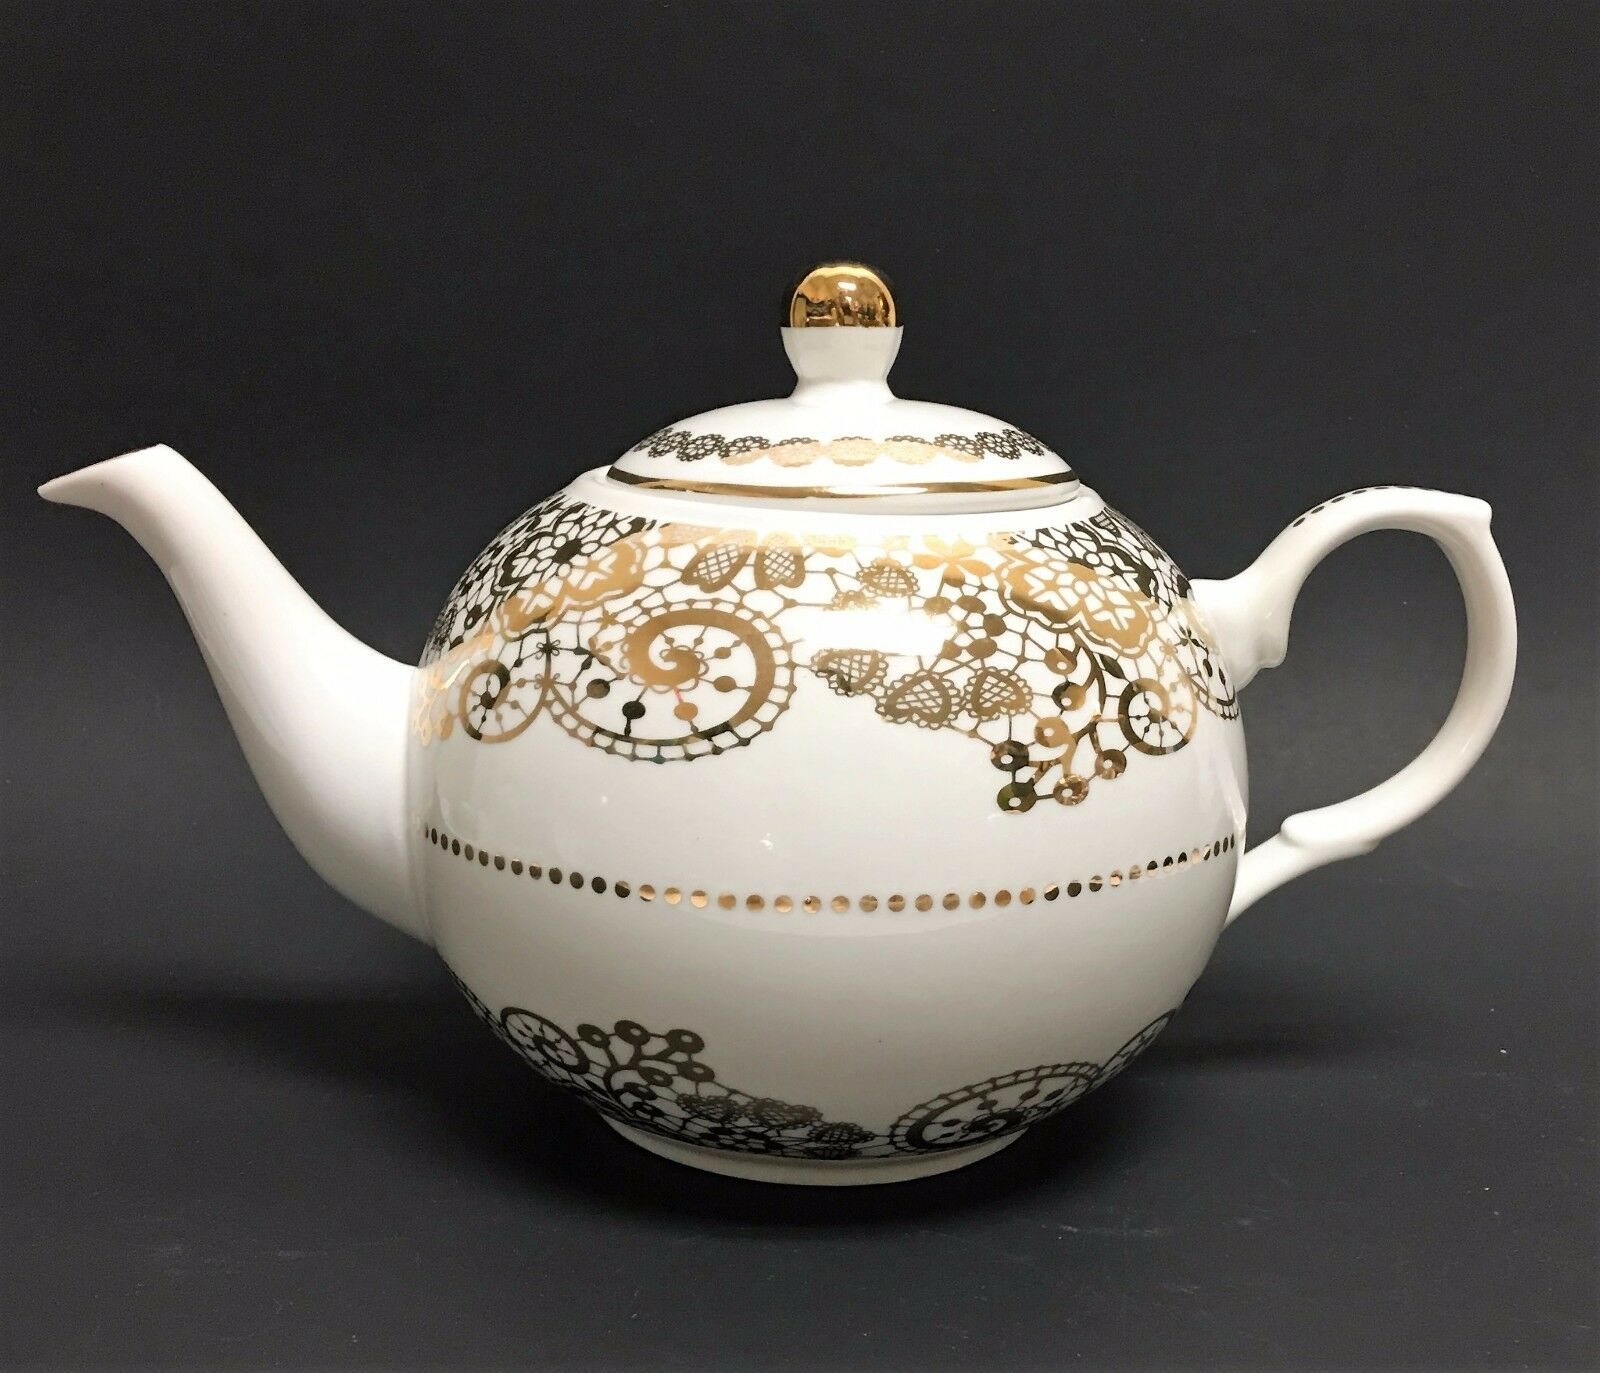 NEW GRACE'S TEA WARE Weiß+Gold TRIM TEAPOT,TEA+COFFEE POT 5 CUPS